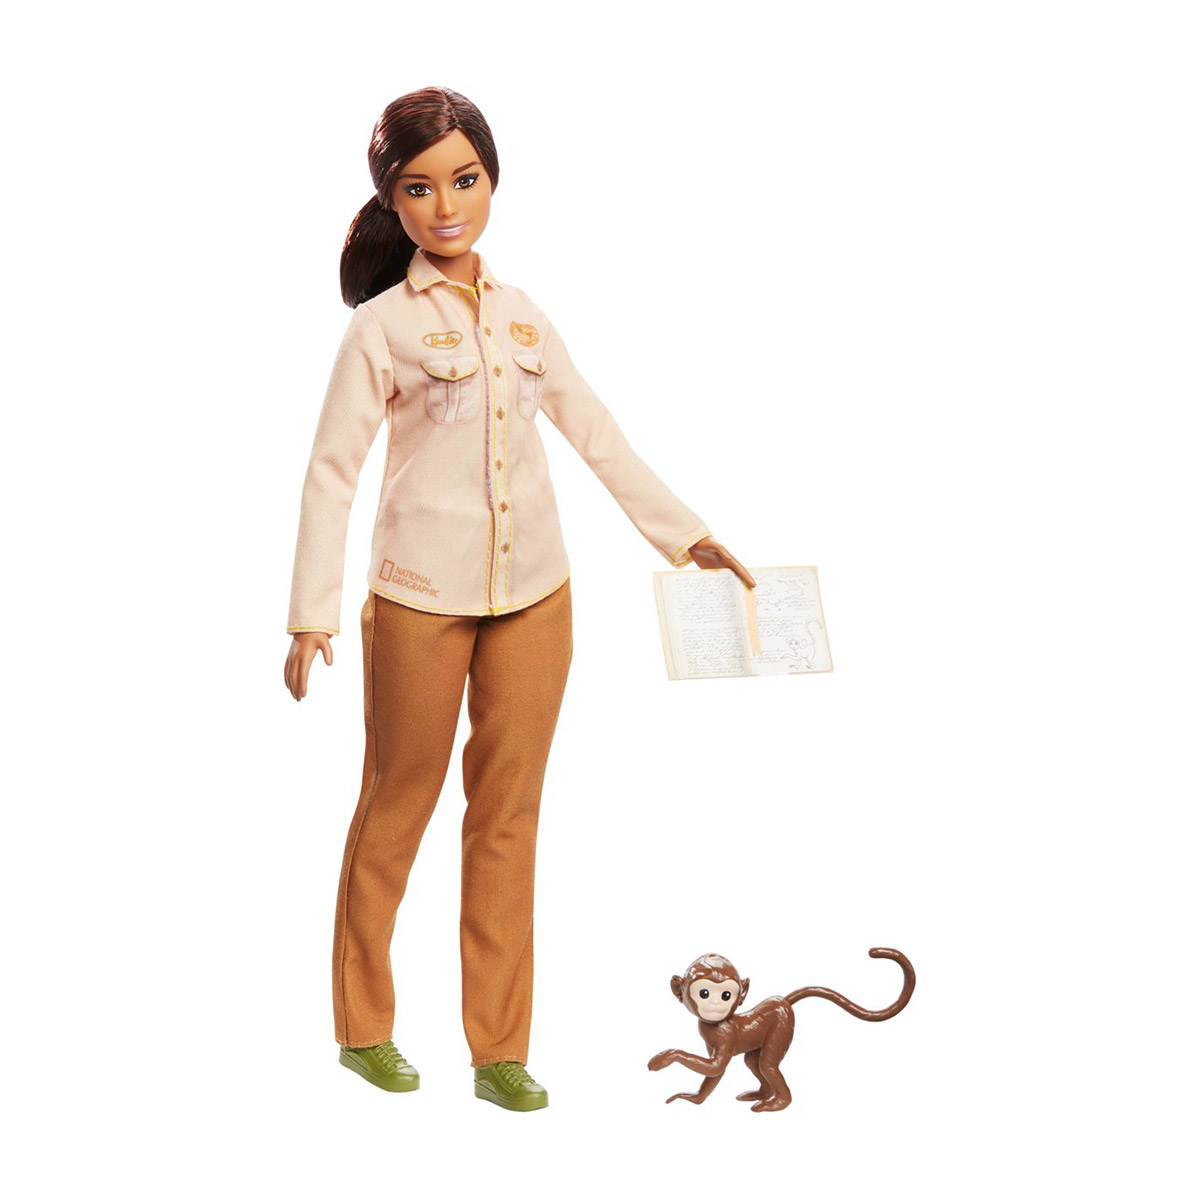 Afbeelding van Barbie Careers Dolls Assorti